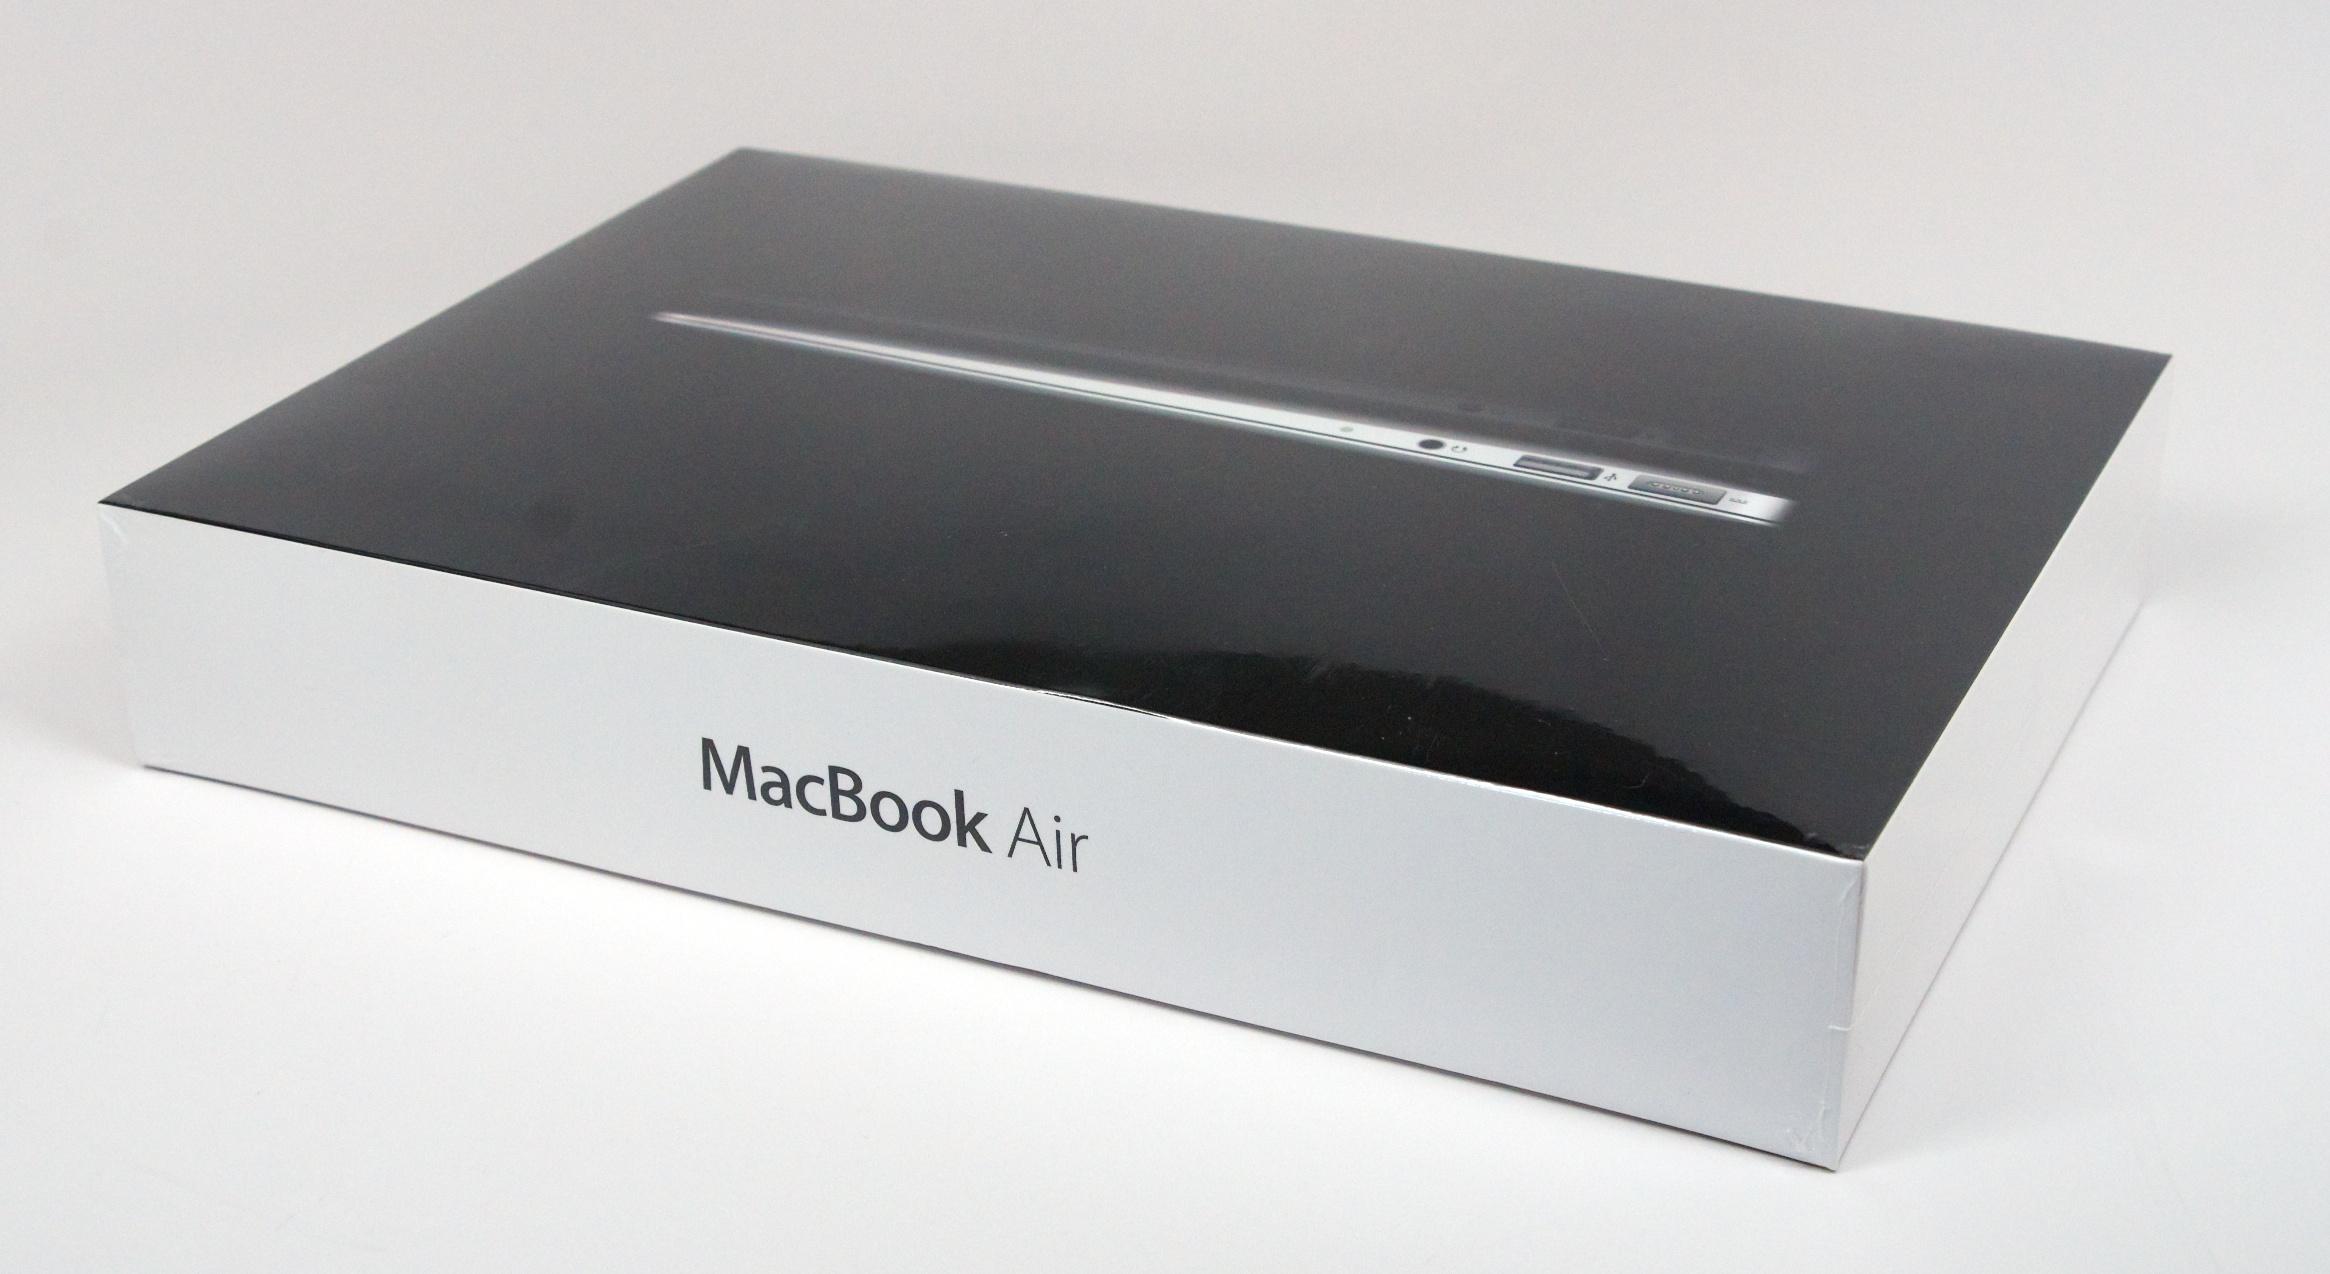 macbook-air-11-inch-review (3)